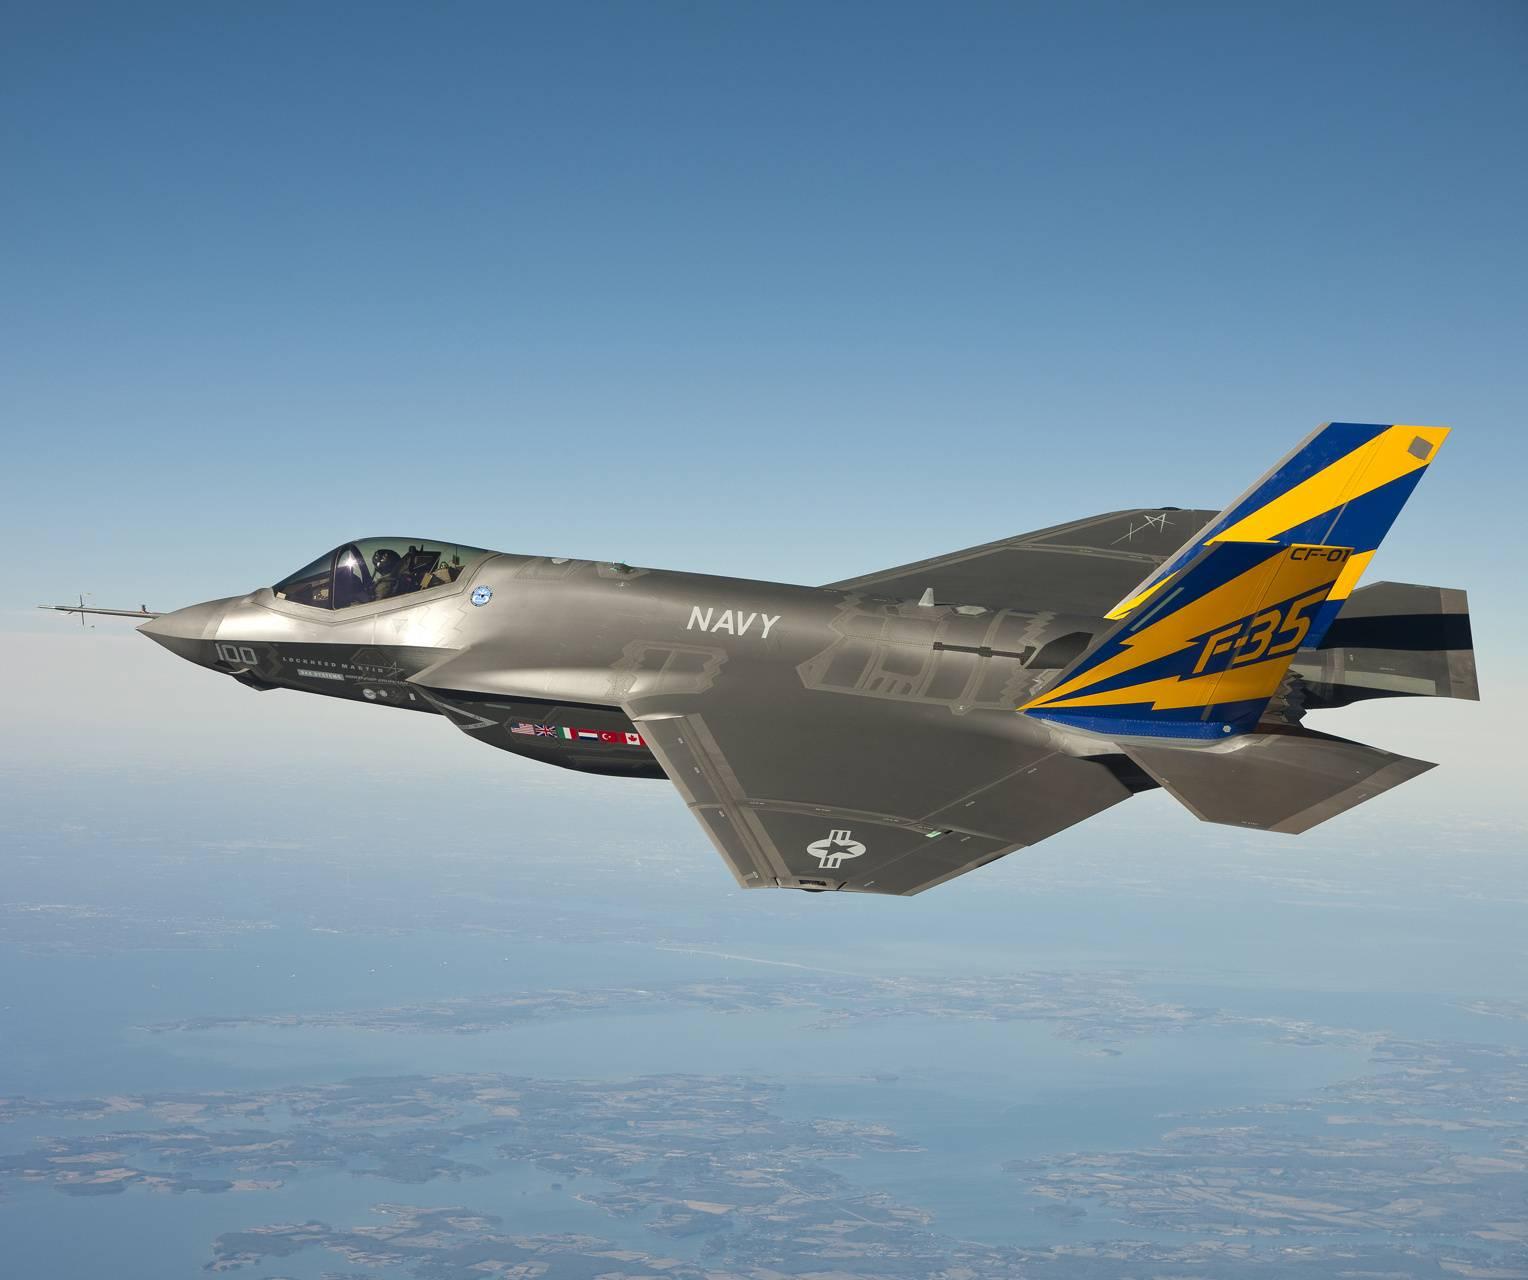 Us Navy F-35